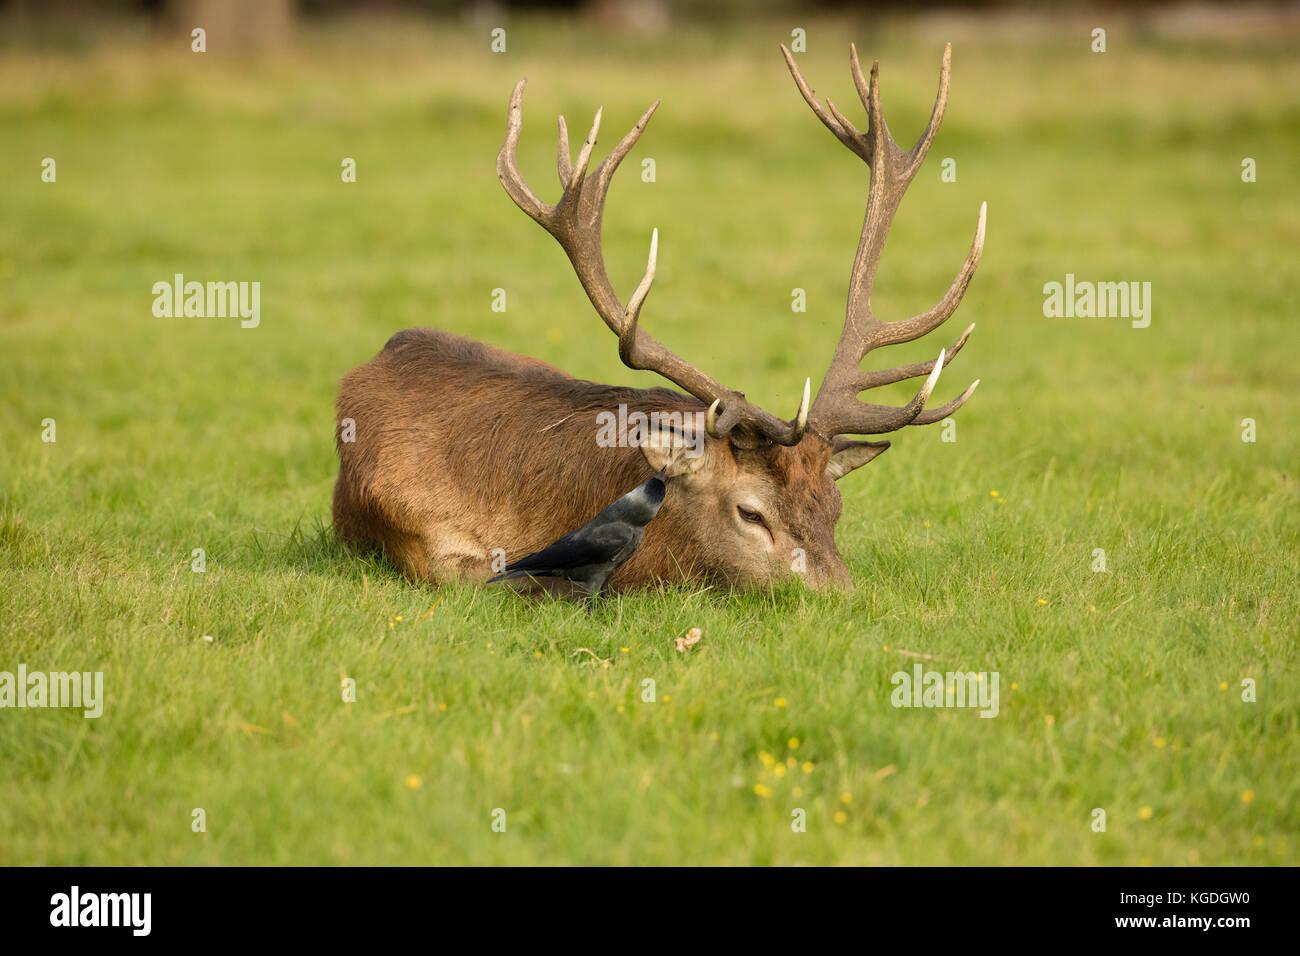 Jackdaw (Corvus monedula), feeding on ticks and other invertebrates on red deer stag, Cervus elaphus, England, UK - Stock Image